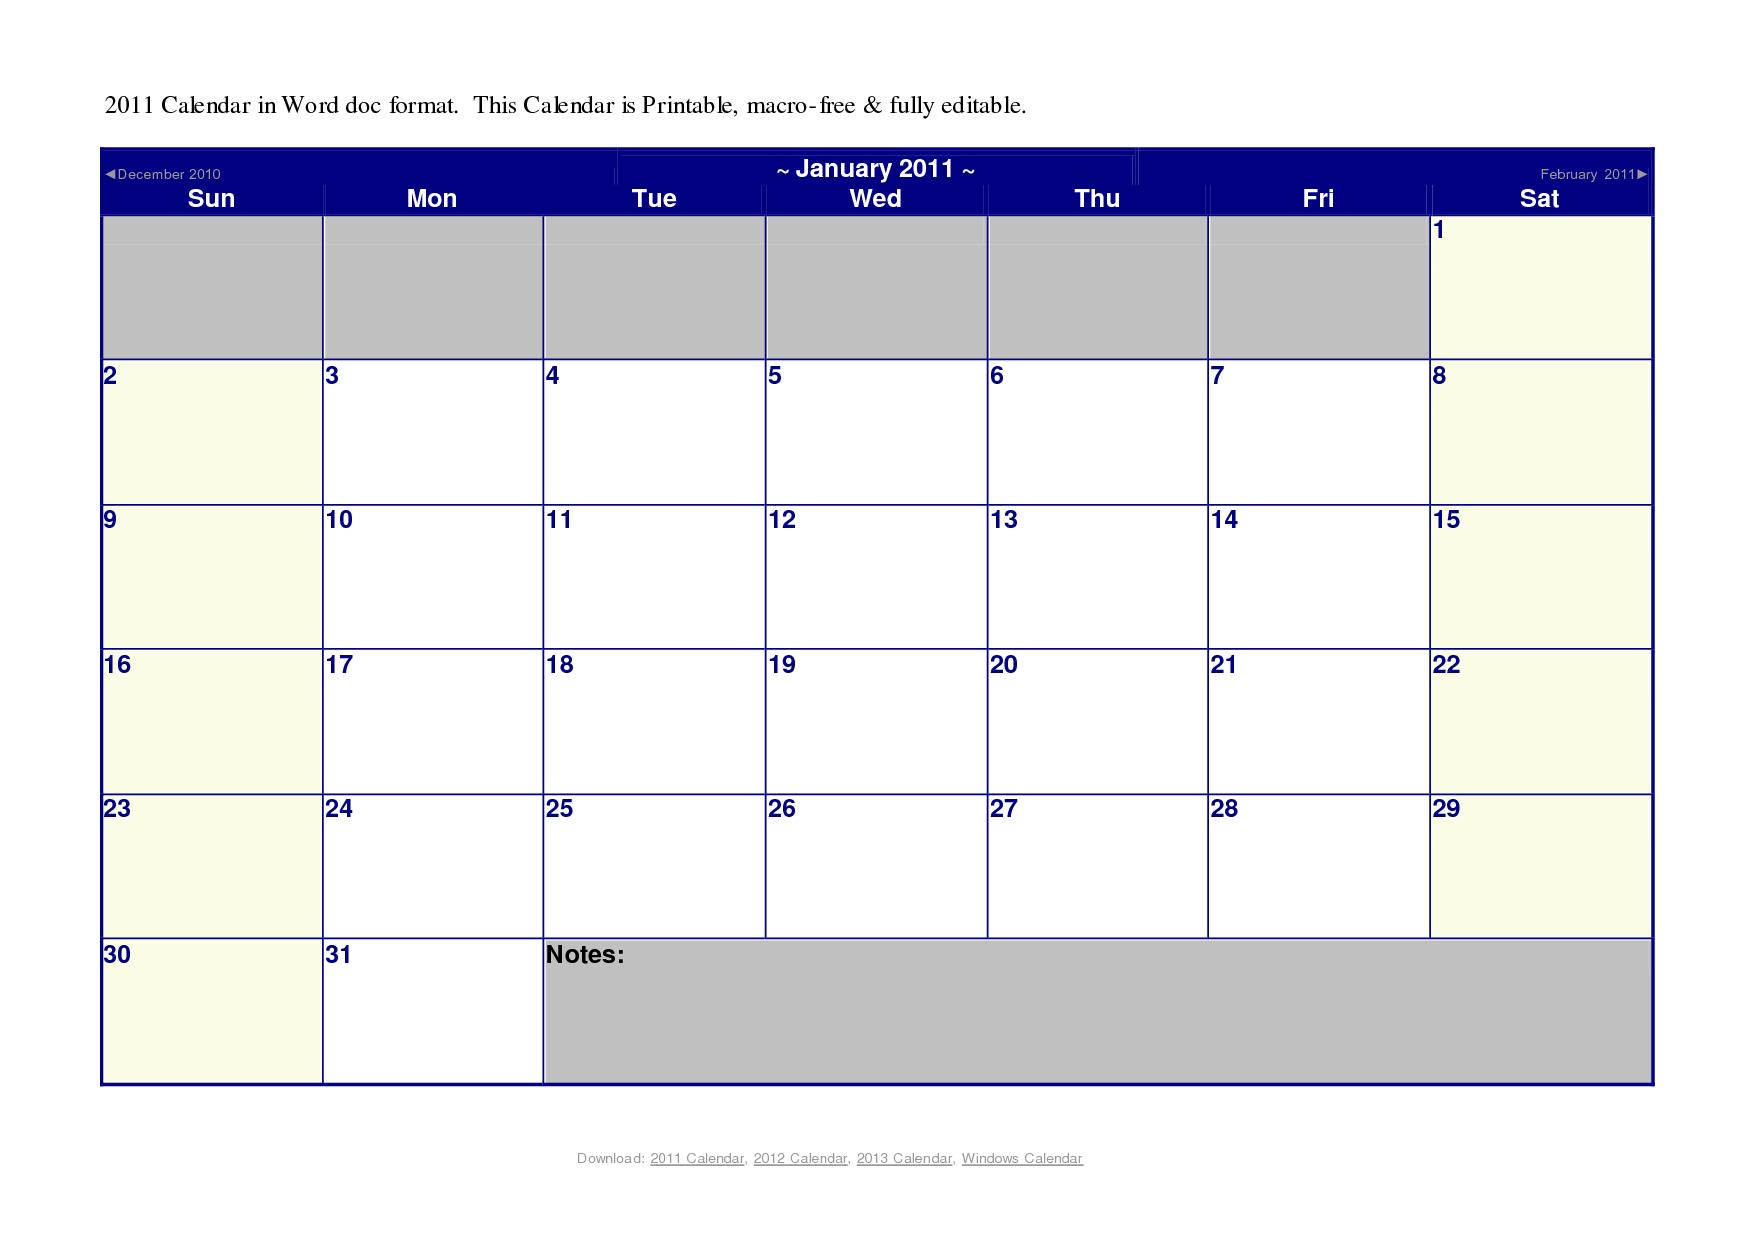 20 Microsoft Blank Calendar Template Images  Microsoft Word with regard to Microsoft Word Templates Calendar